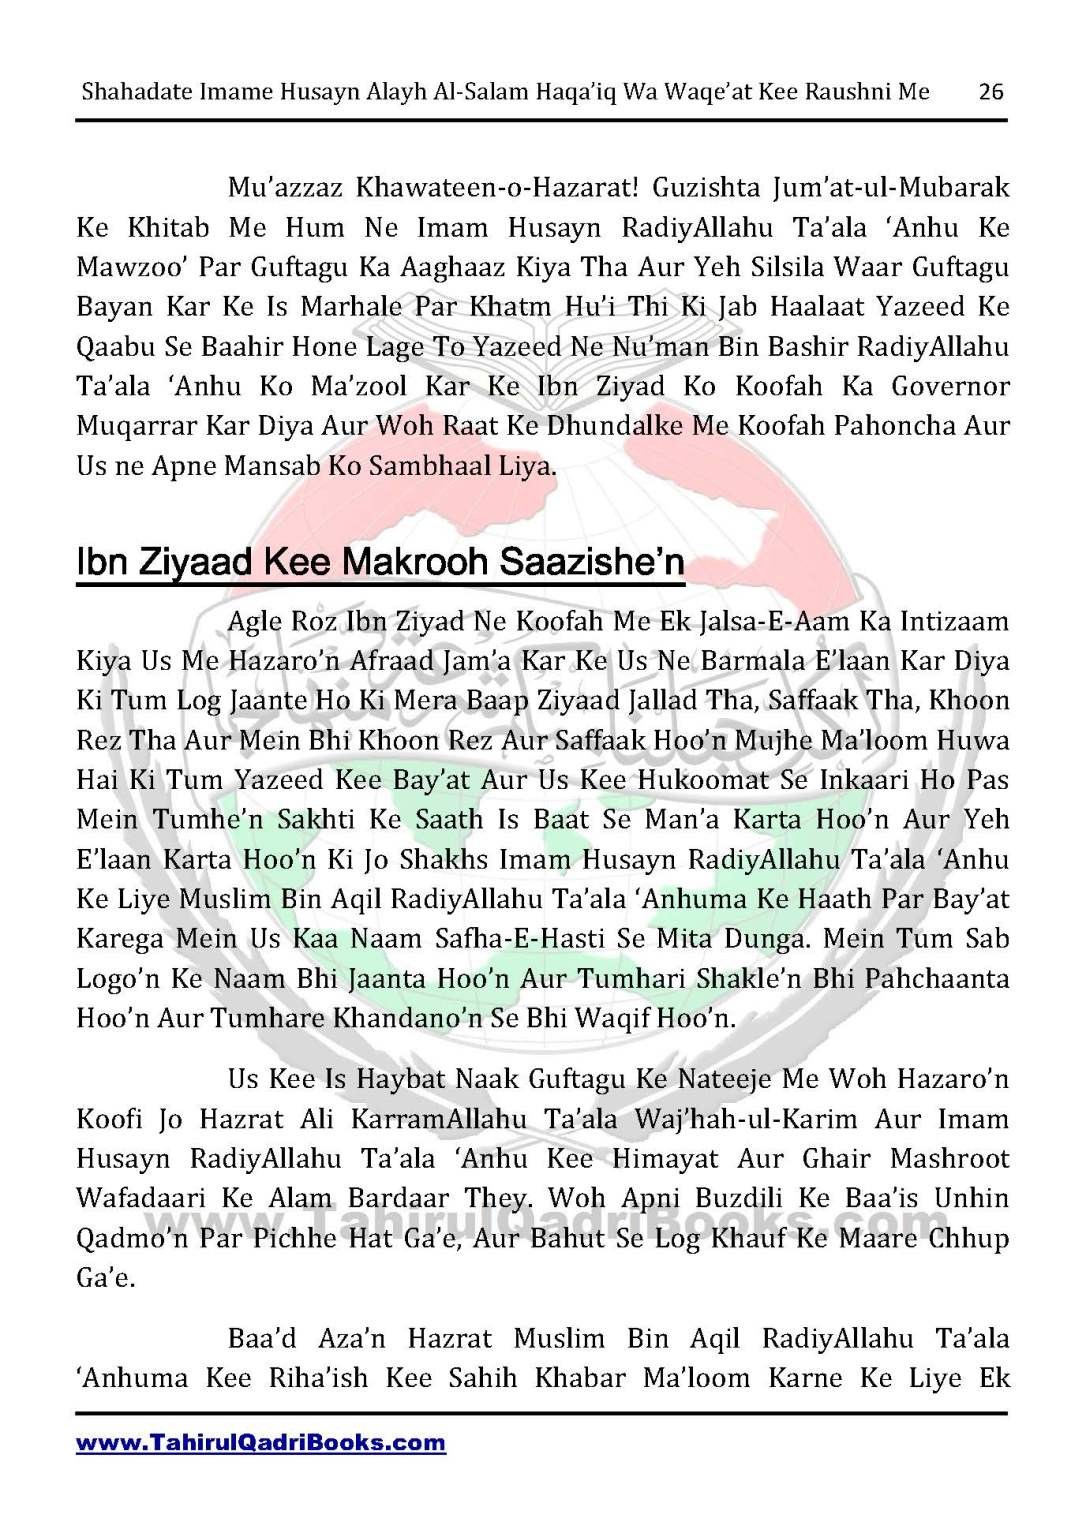 shahadate-imame-husayn-alayh-is-salam-haqaiq-wa-waqe_at-kee-raushni-me-in-roman-urdu-unlocked_Page_26